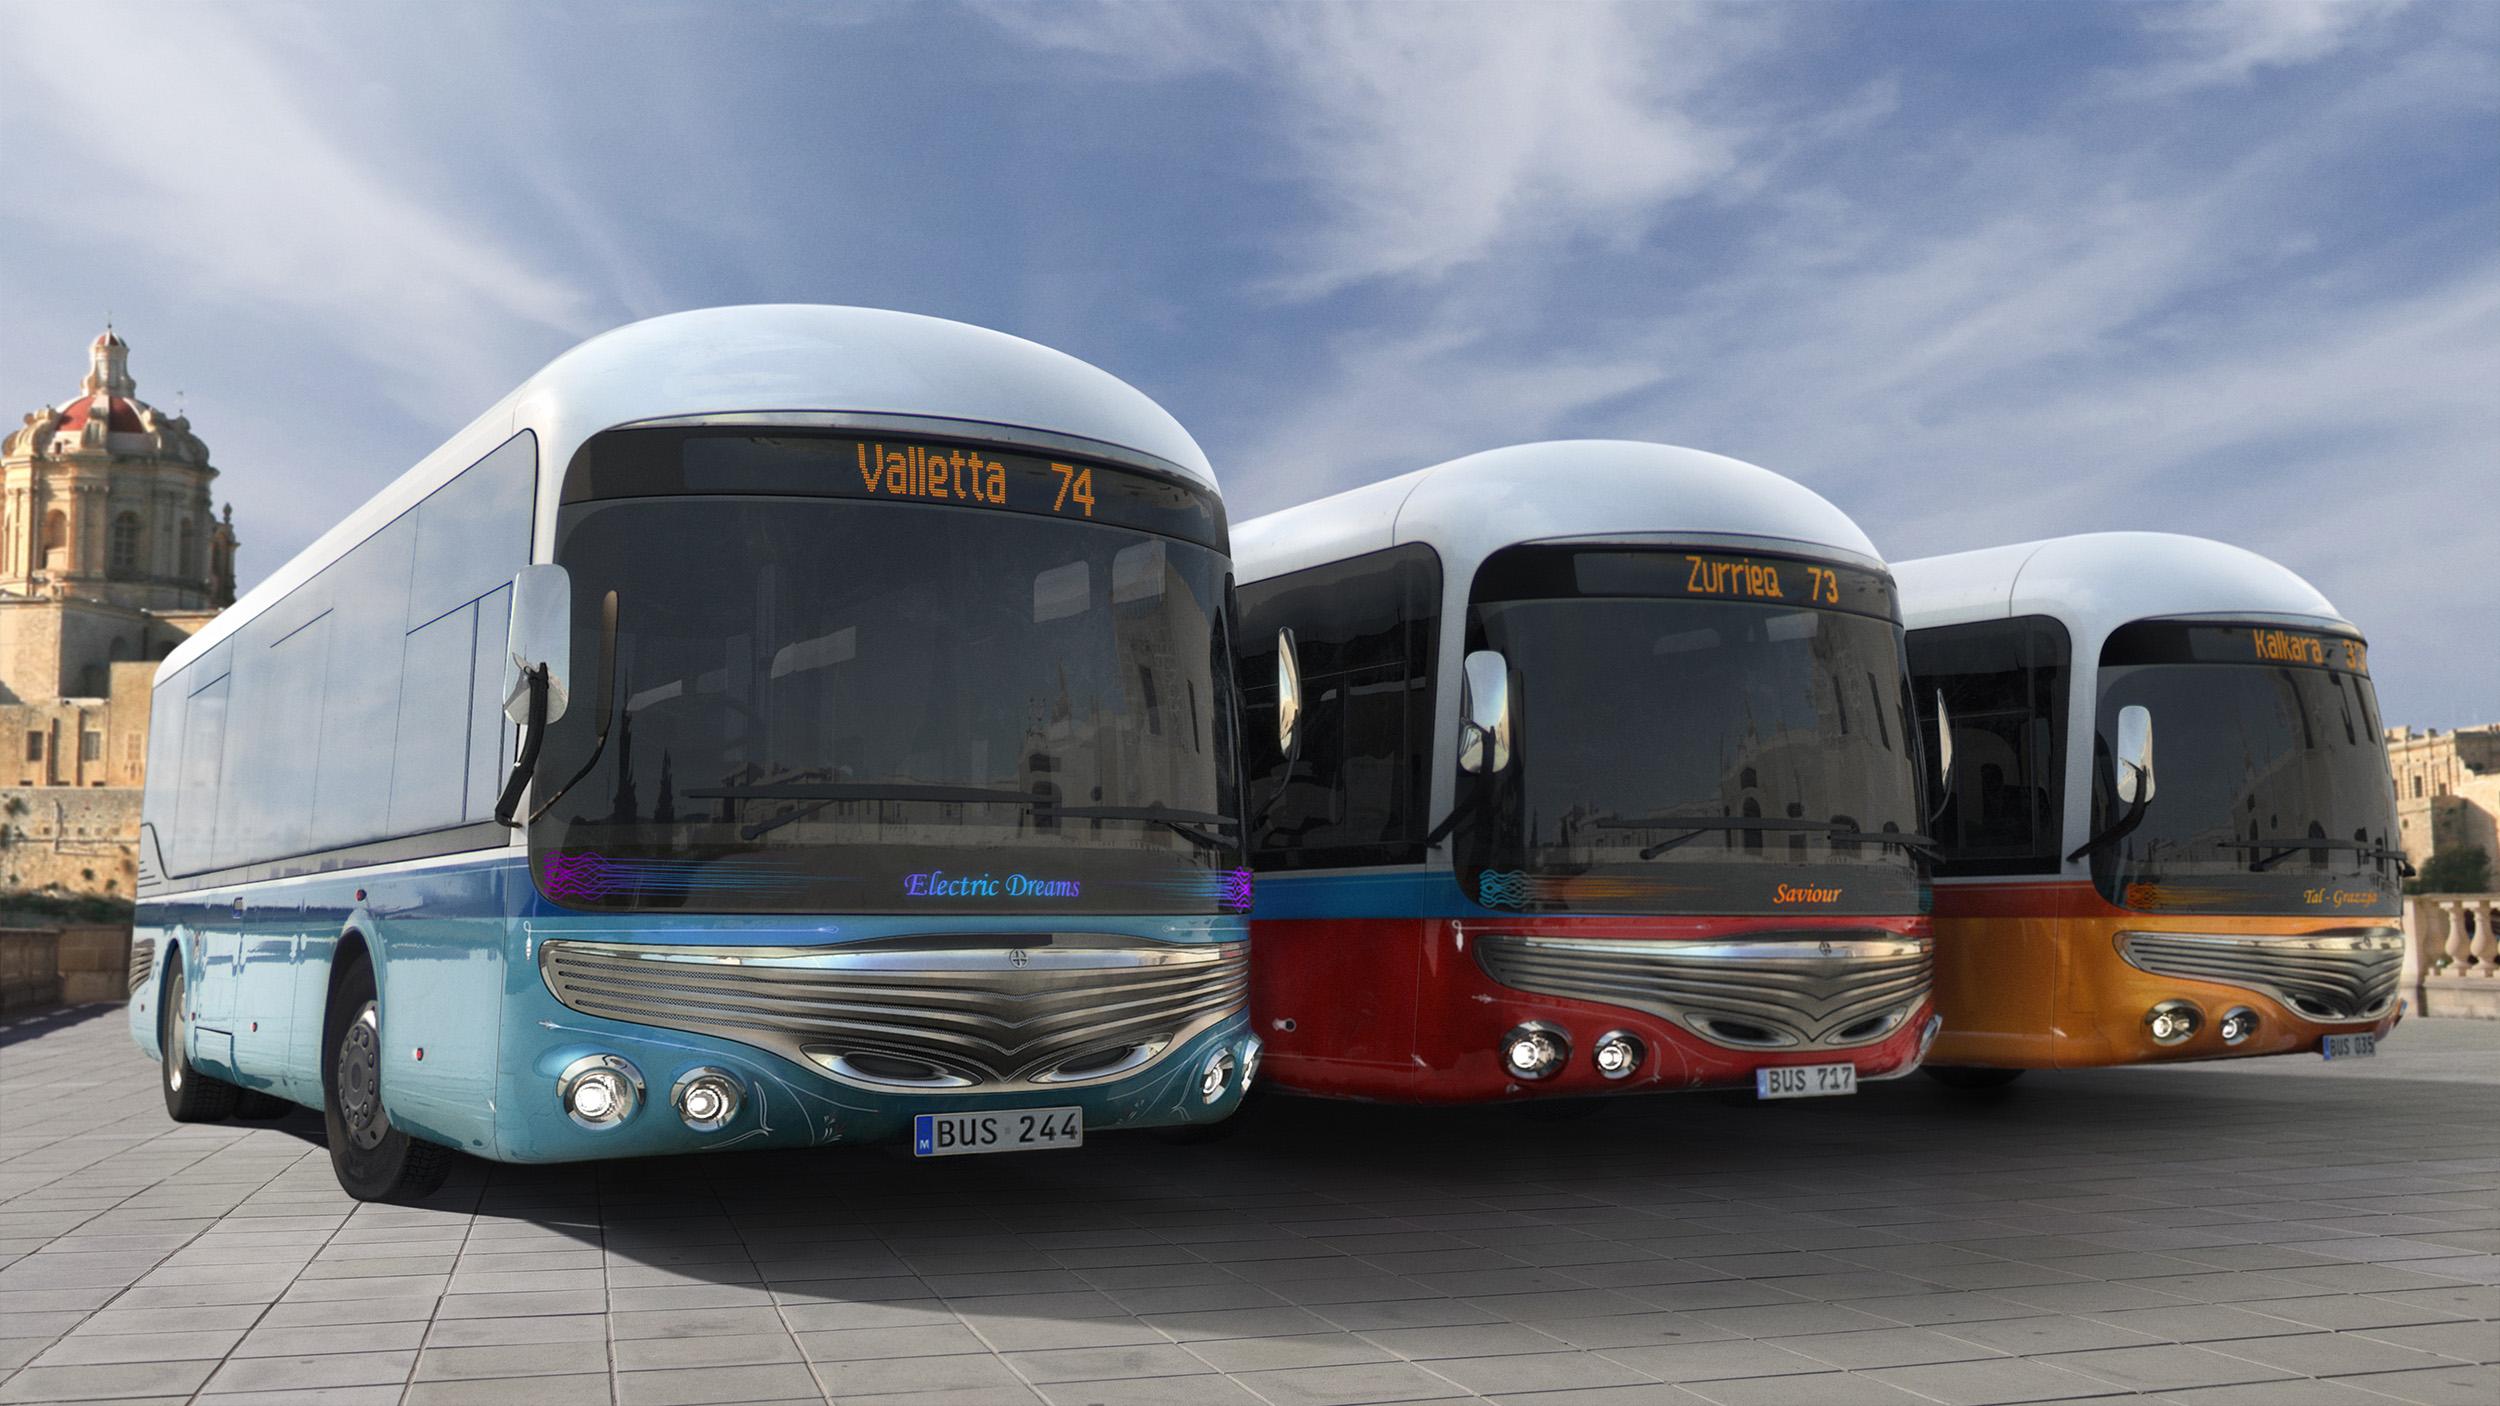 Visualisation_02_Mizzi Studio_Malta Bus Reborn_web.jpg